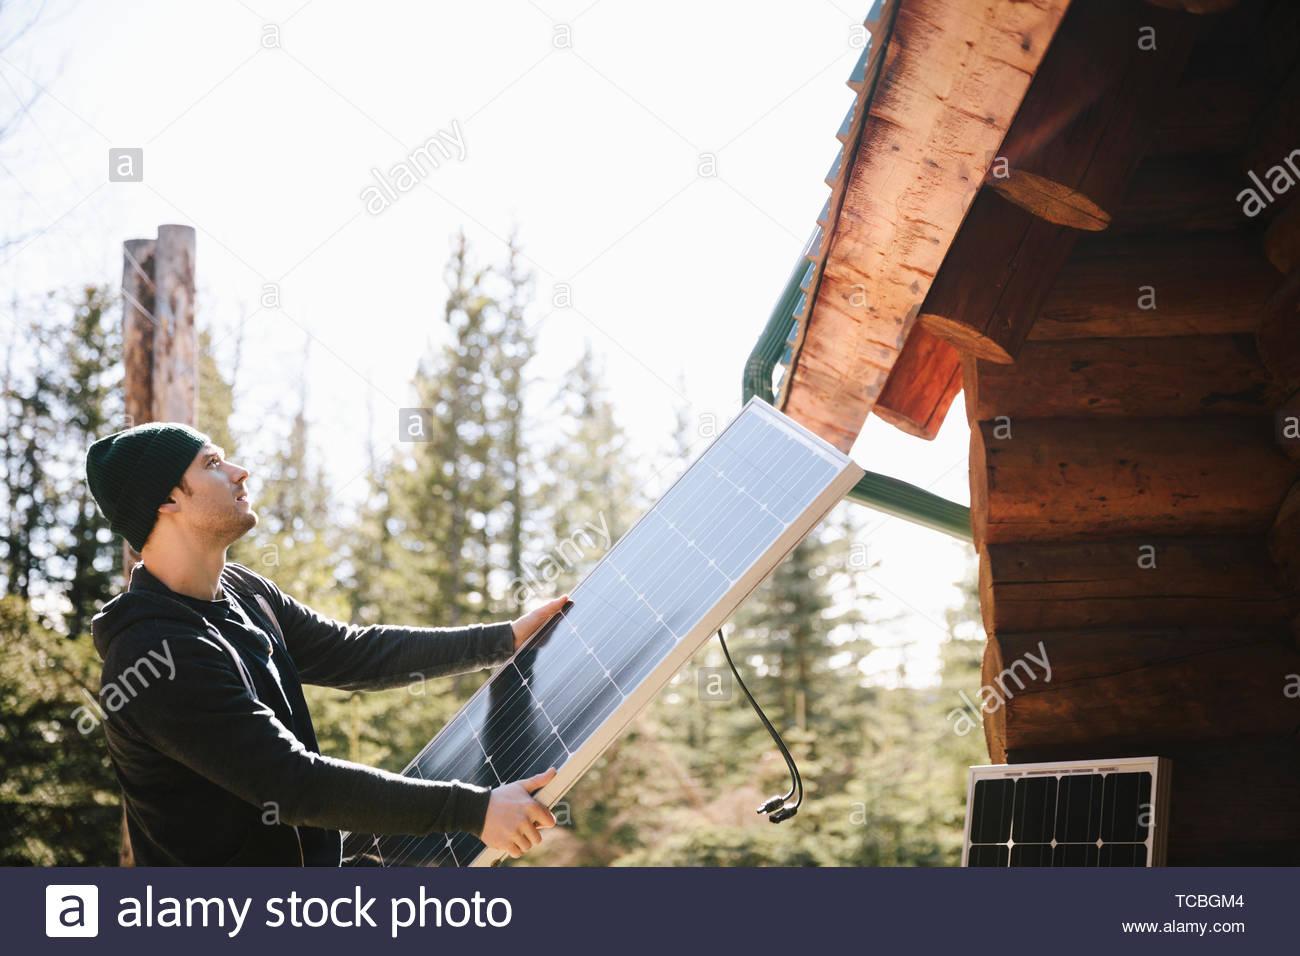 Man installing solar panels outside cabin - Stock Image